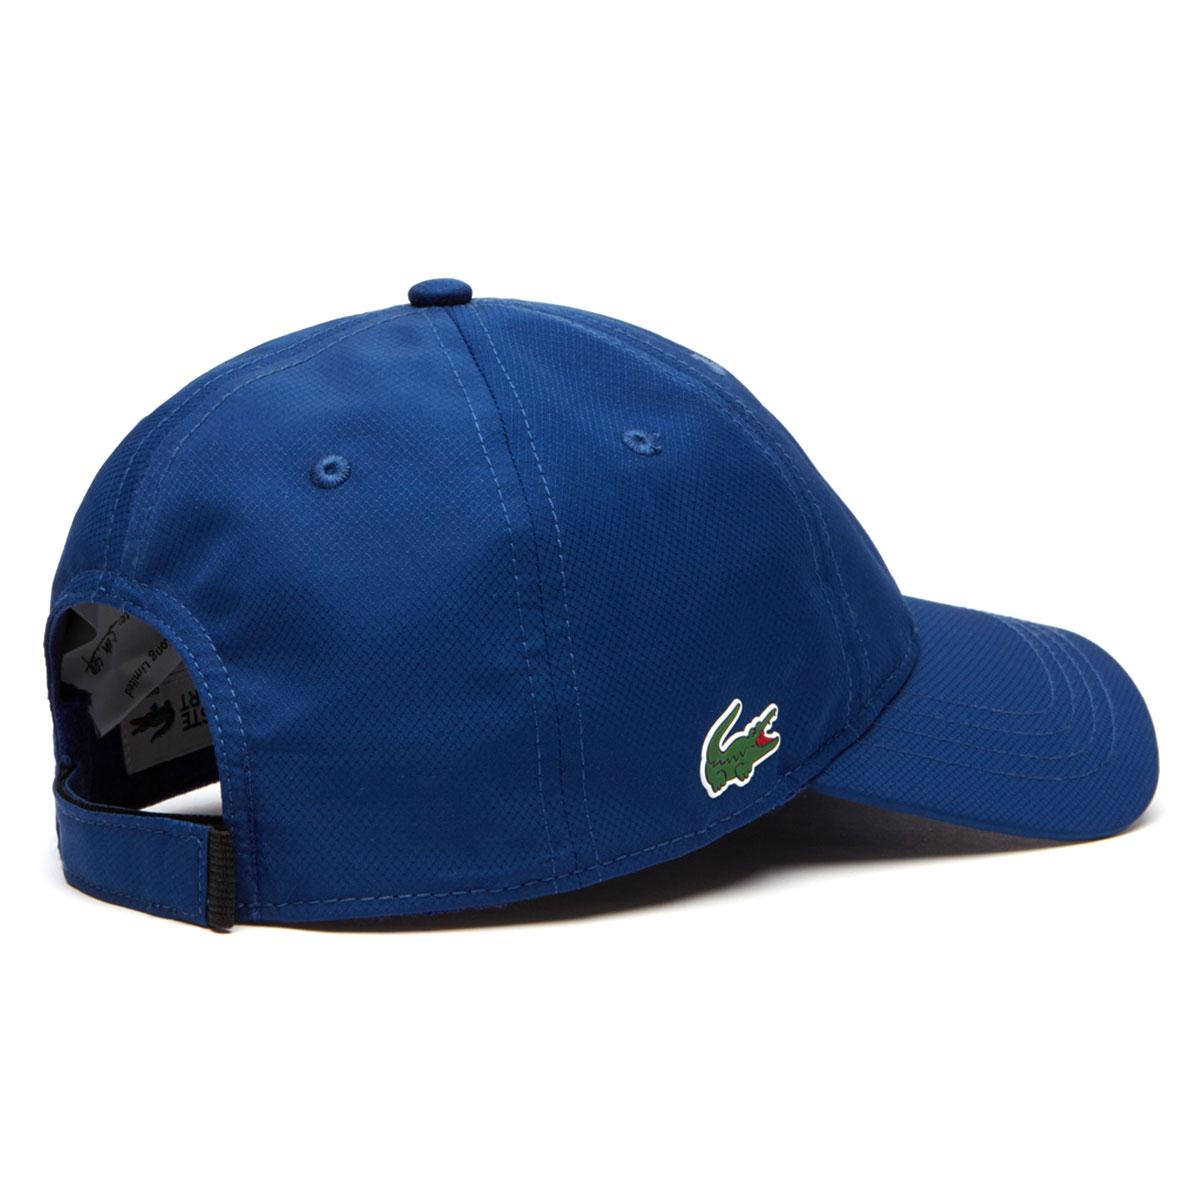 0b702cbb32c Lacoste Mens 2019 RK2447 Sports Weave Taffeta Solid Diamond Baseball ...